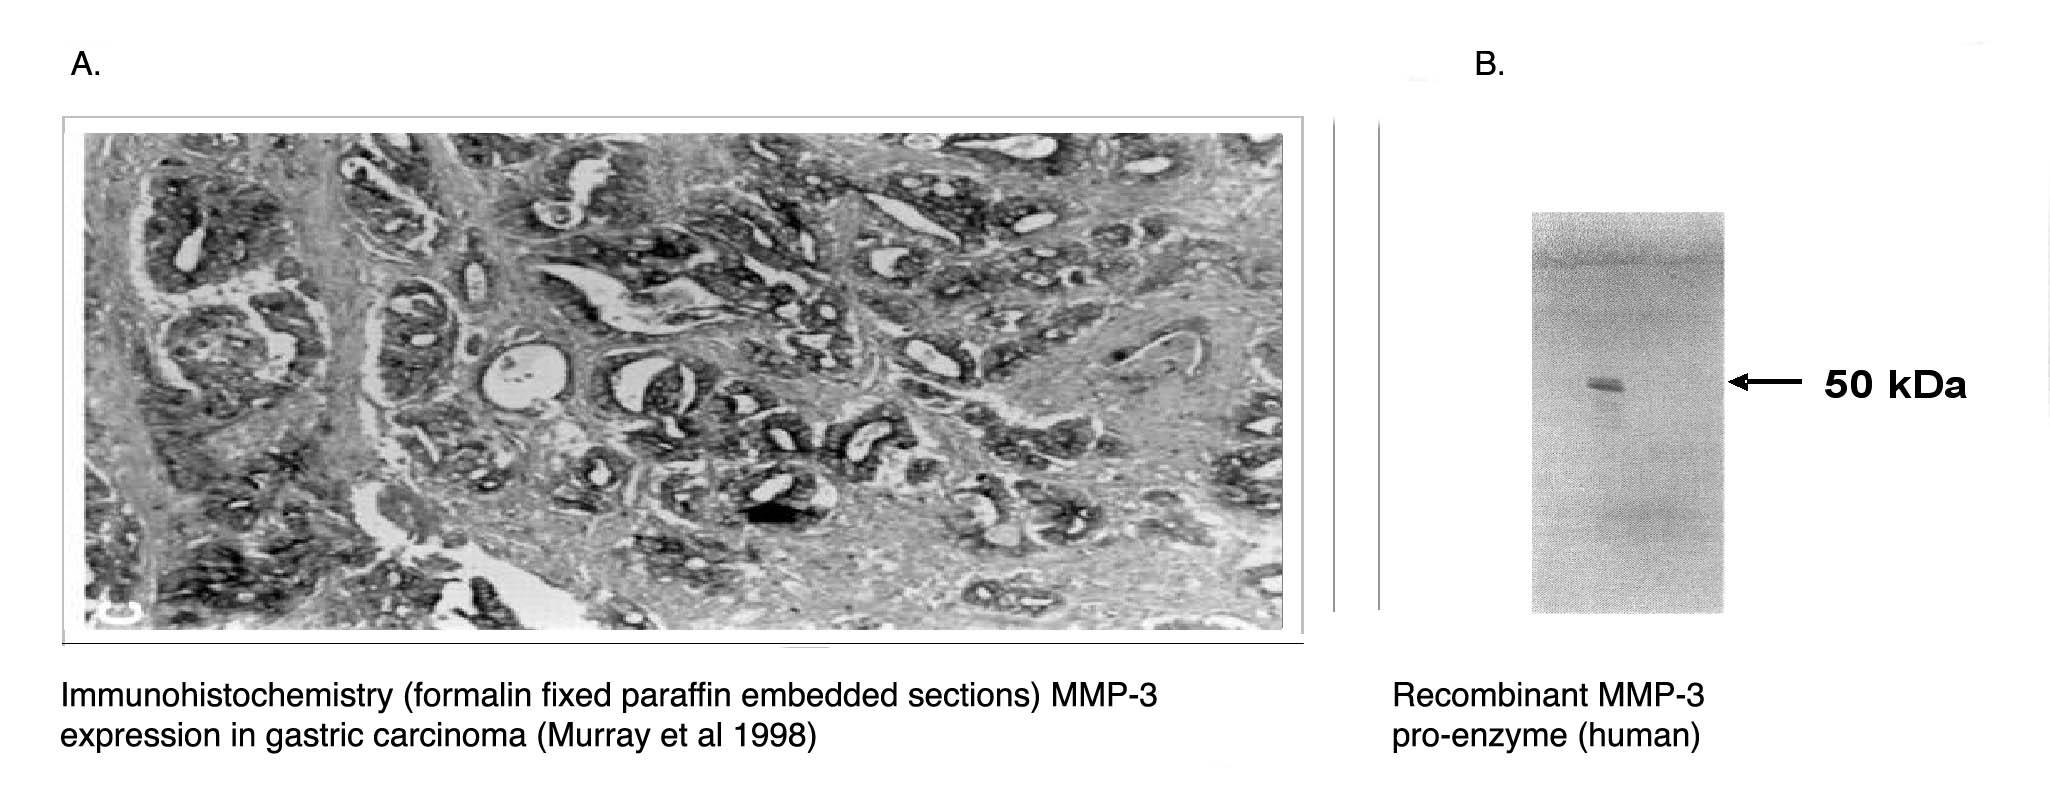 """ Left:  Immunohistochemical staining of human gastric carcinoma tissue using MMP-3 antibody (Cat. No. X2055M). Right:  Western blot of recombinant human MMP-3 proenzyme using MMP-3 antibody."""